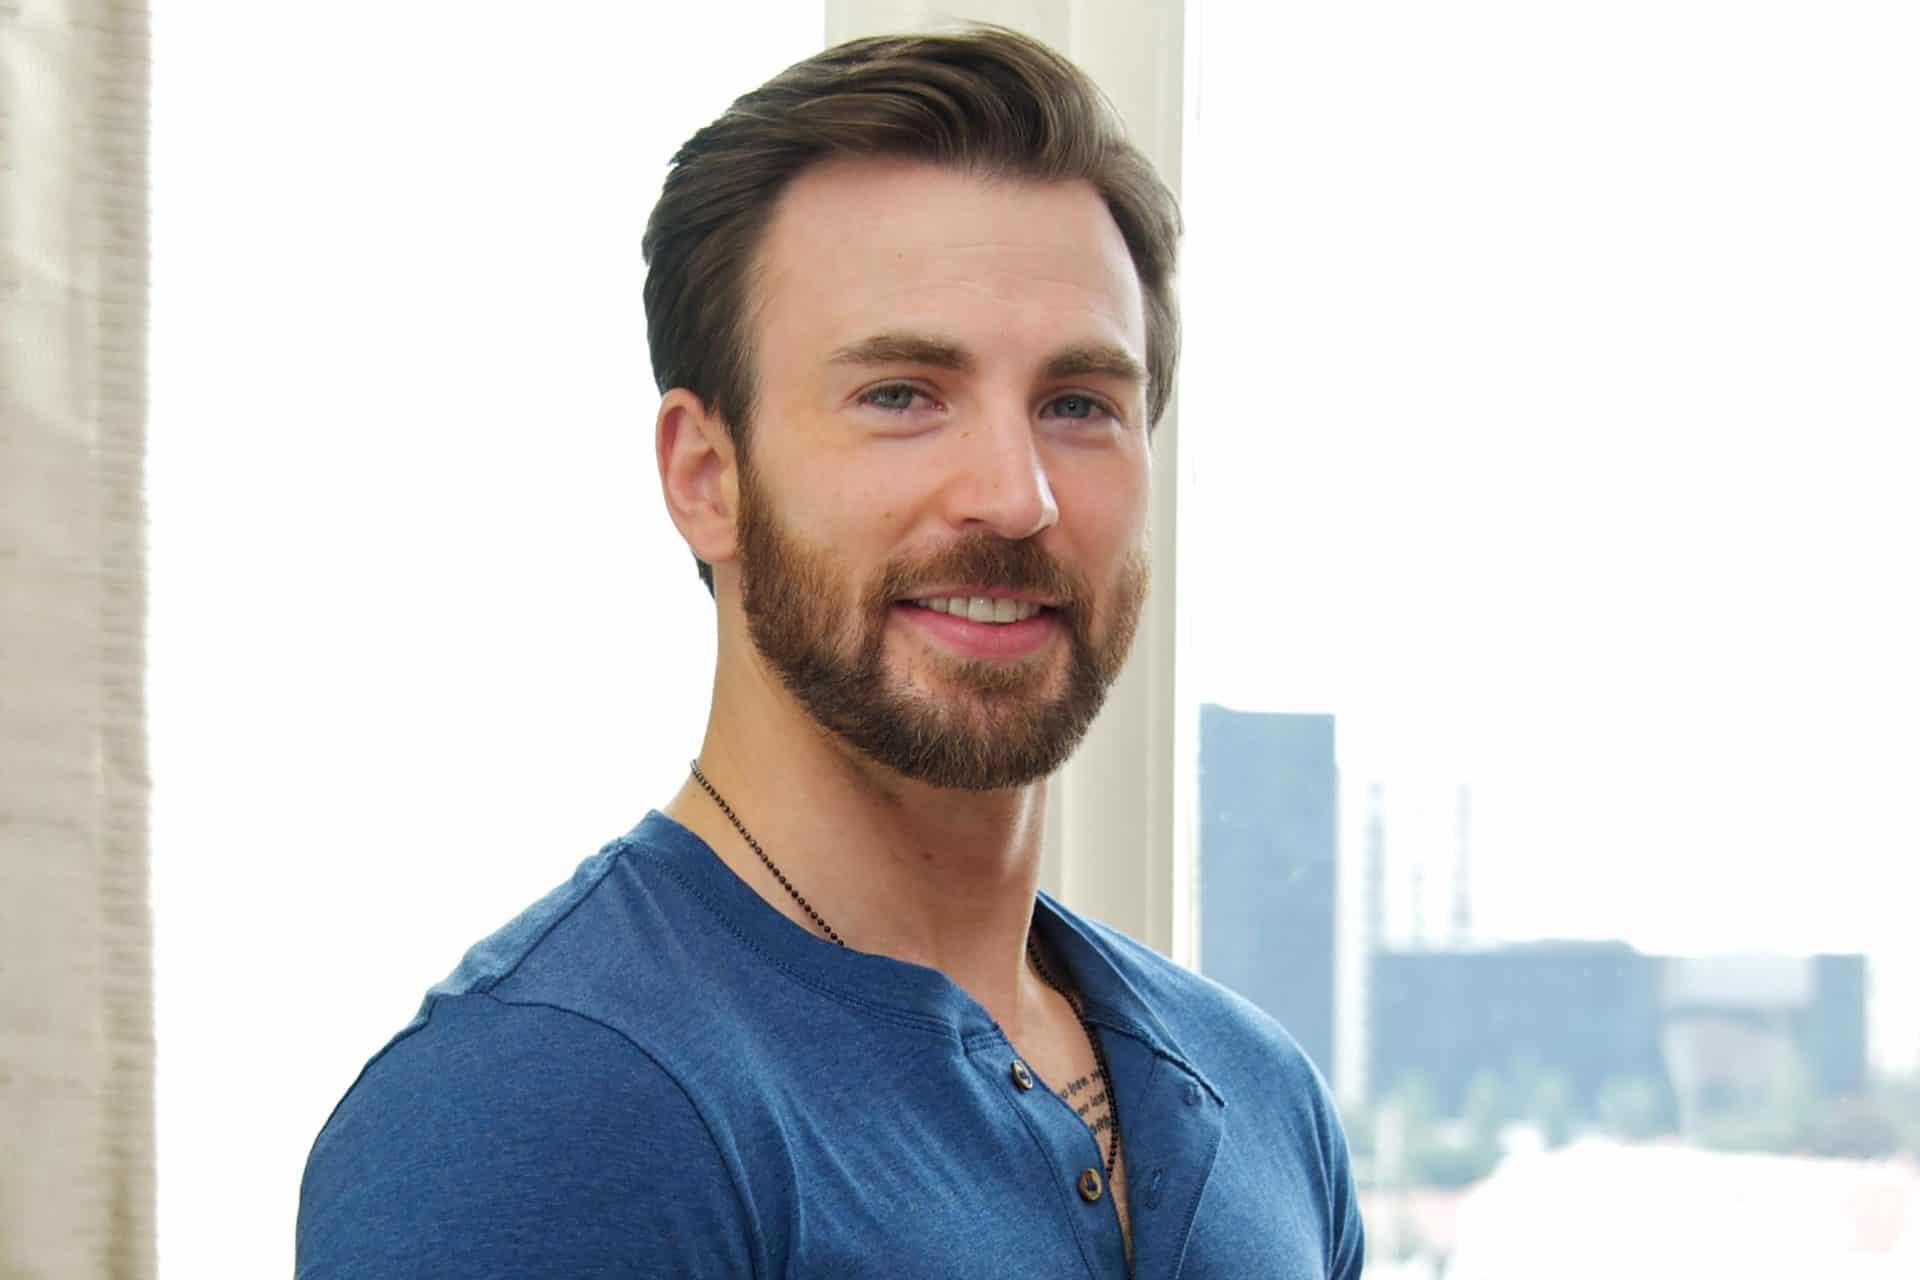 Chris Evans ringrazia i fan di Avengers: Endgame per i ...